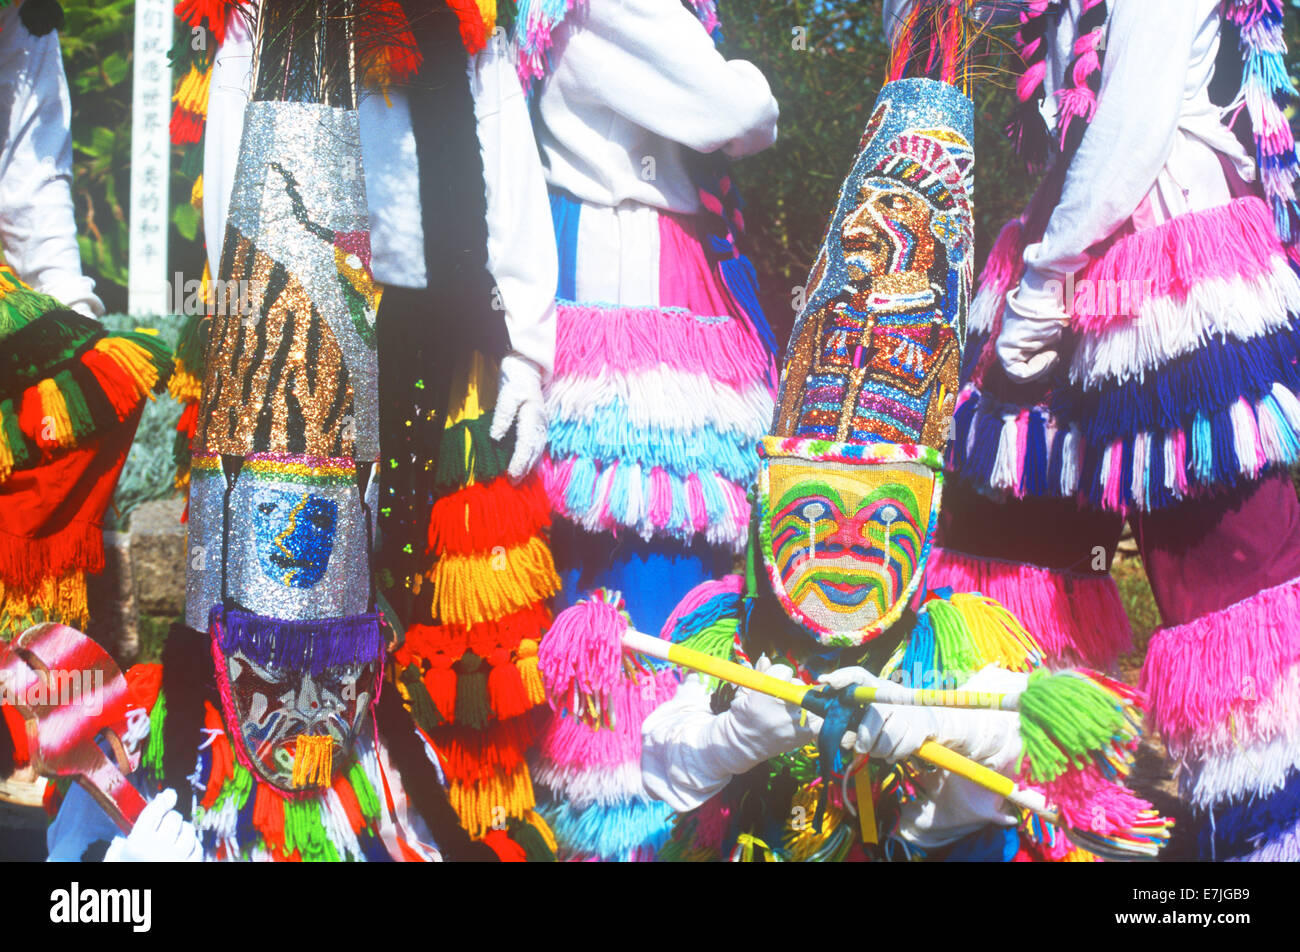 Goombeys, Spring Fever Fest, Warwick, Bermuda - Stock Image